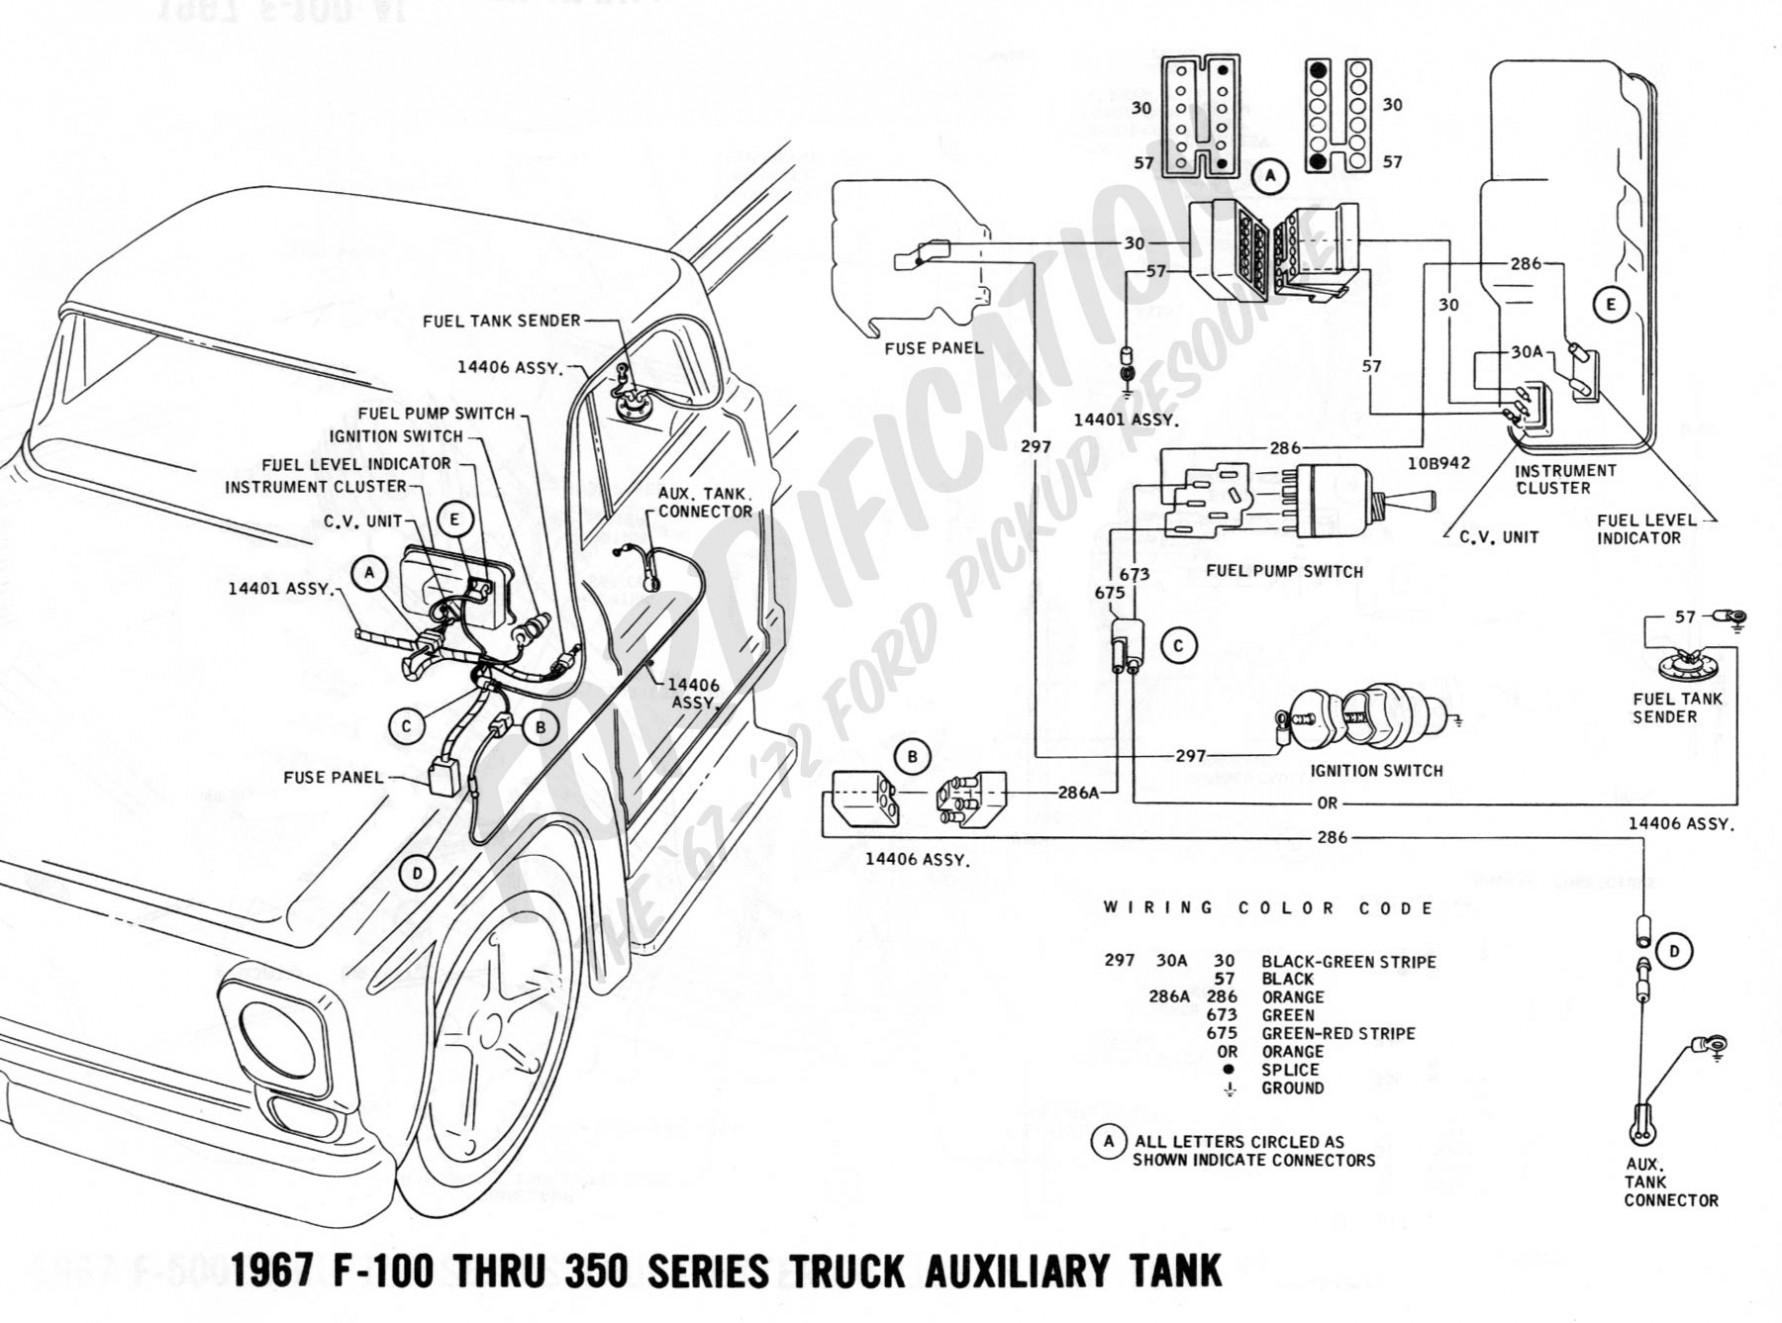 1987 ford F700 Brake System Diagram Diagram] ford F700 Brake Diagram Full Version Hd Quality Of 1987 ford F700 Brake System Diagram